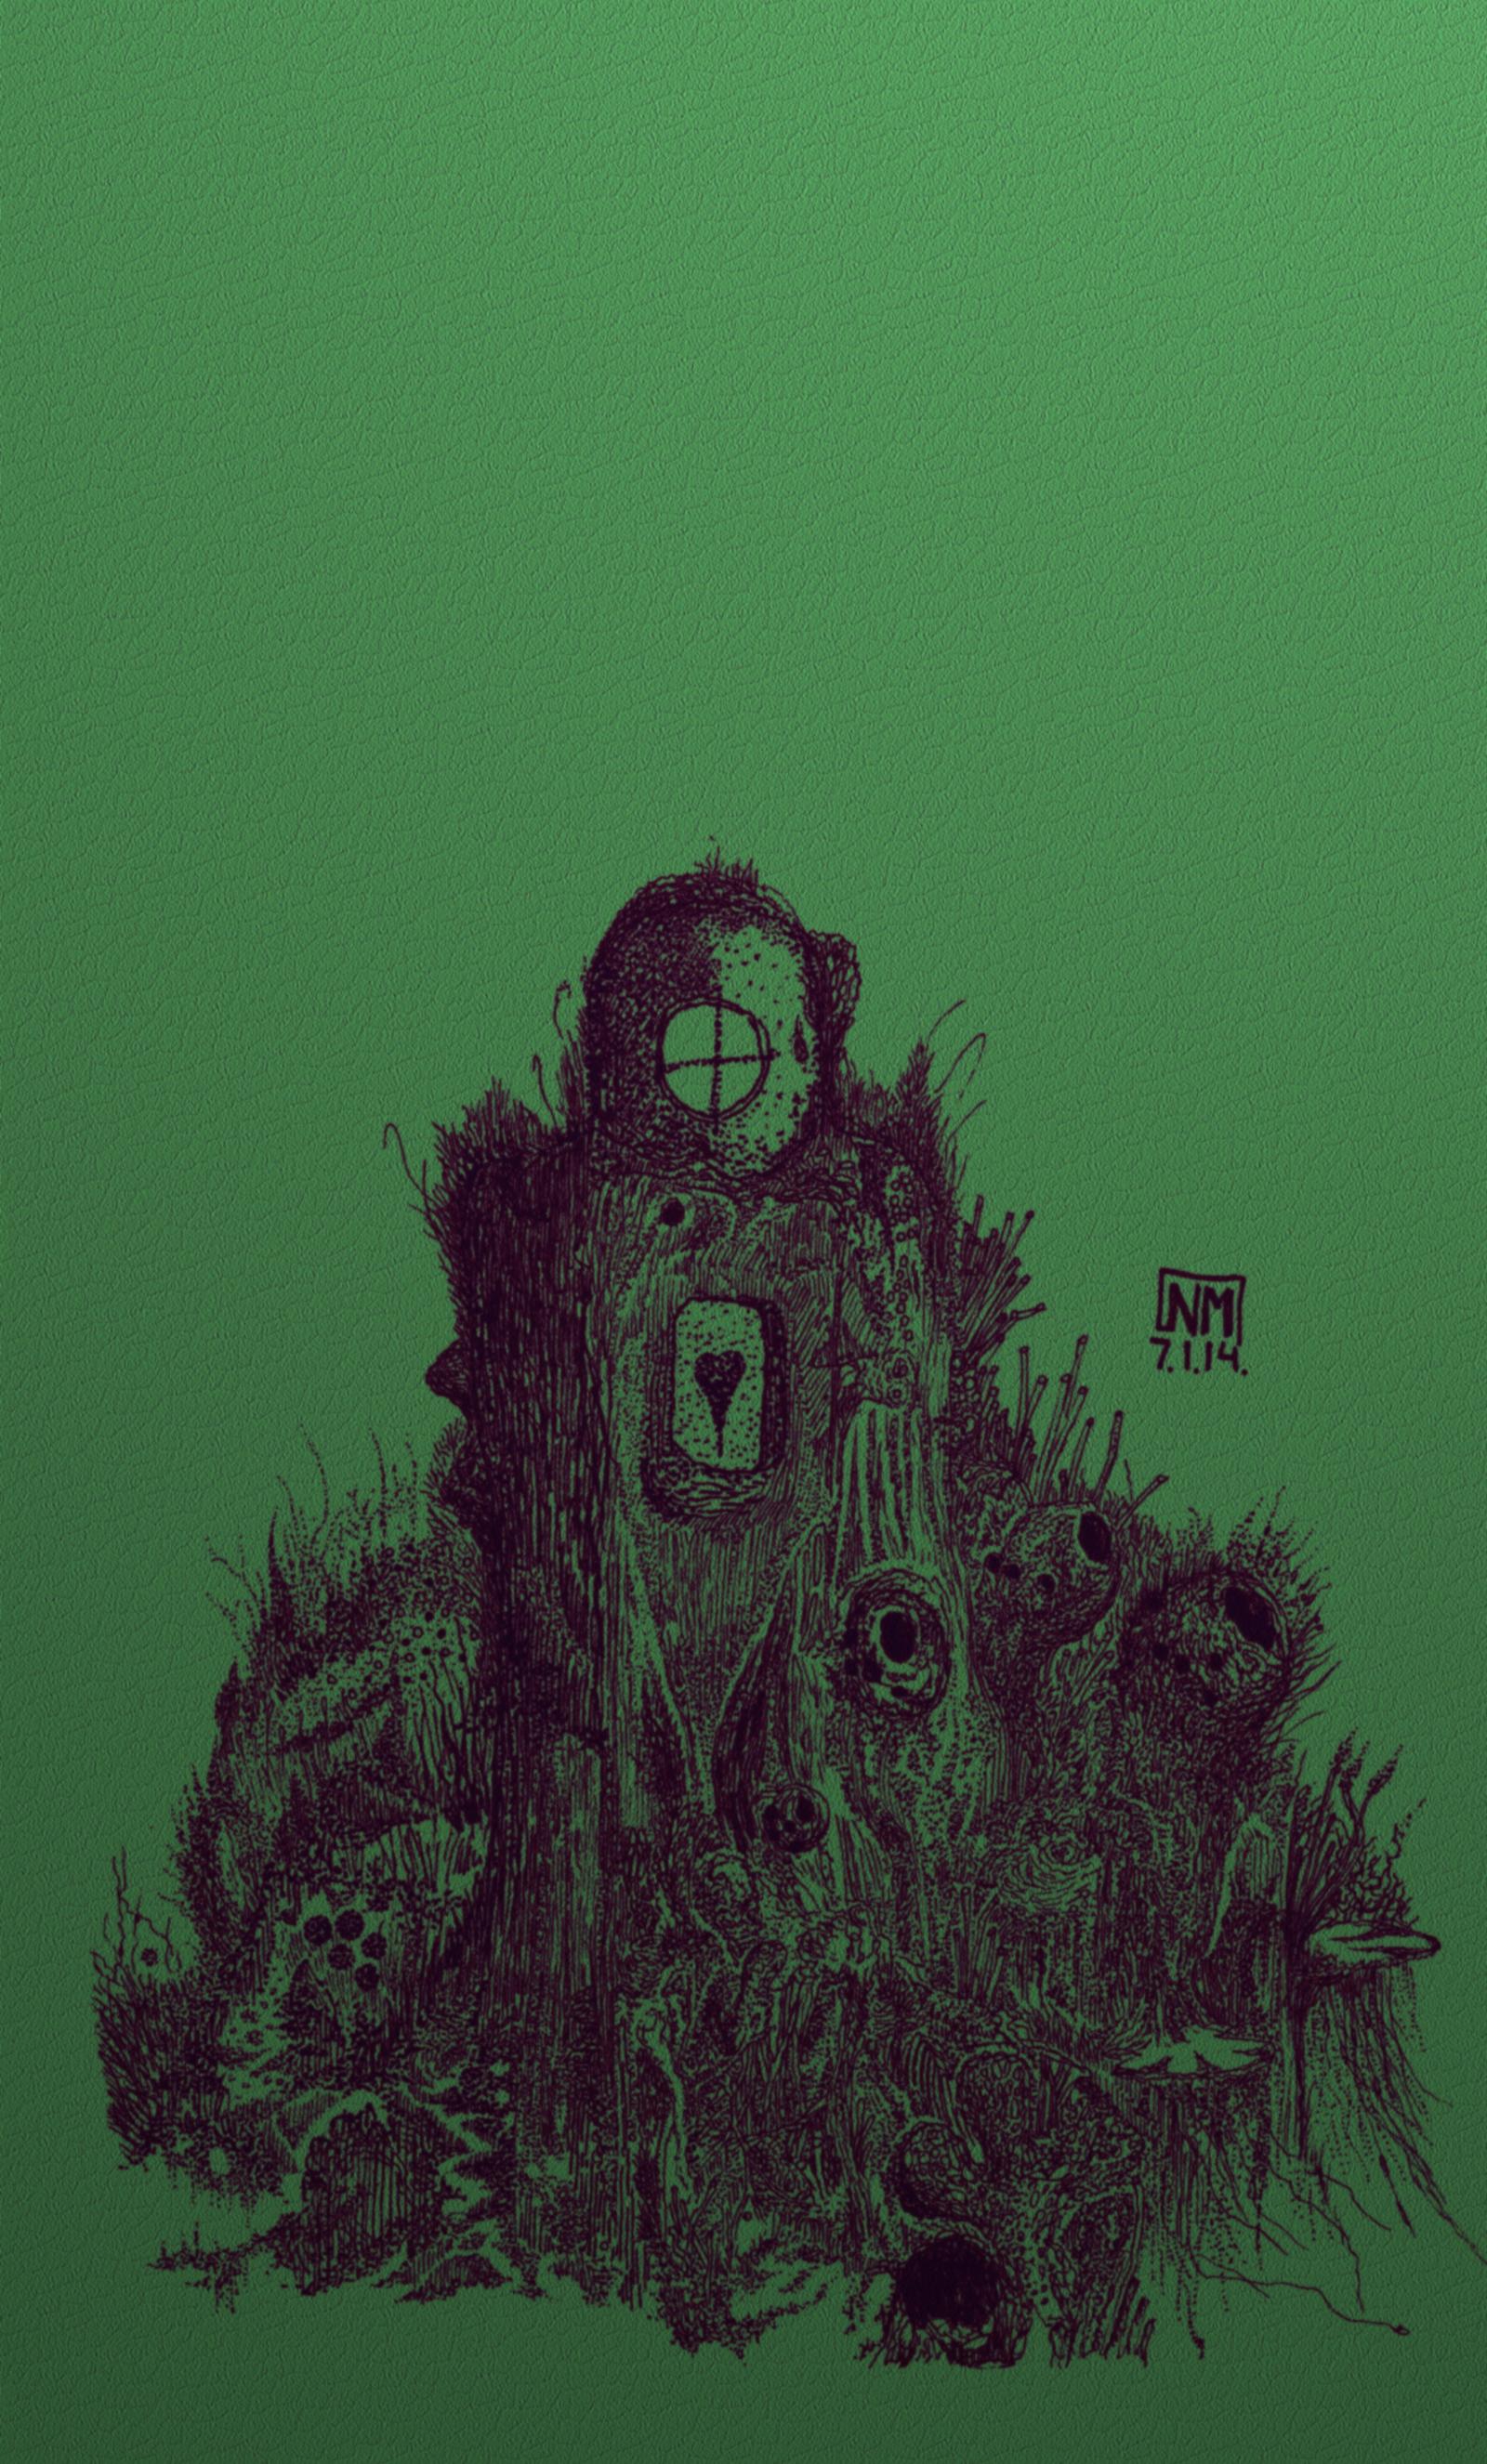 Entombed Under The Sea v2 by NMatychuk